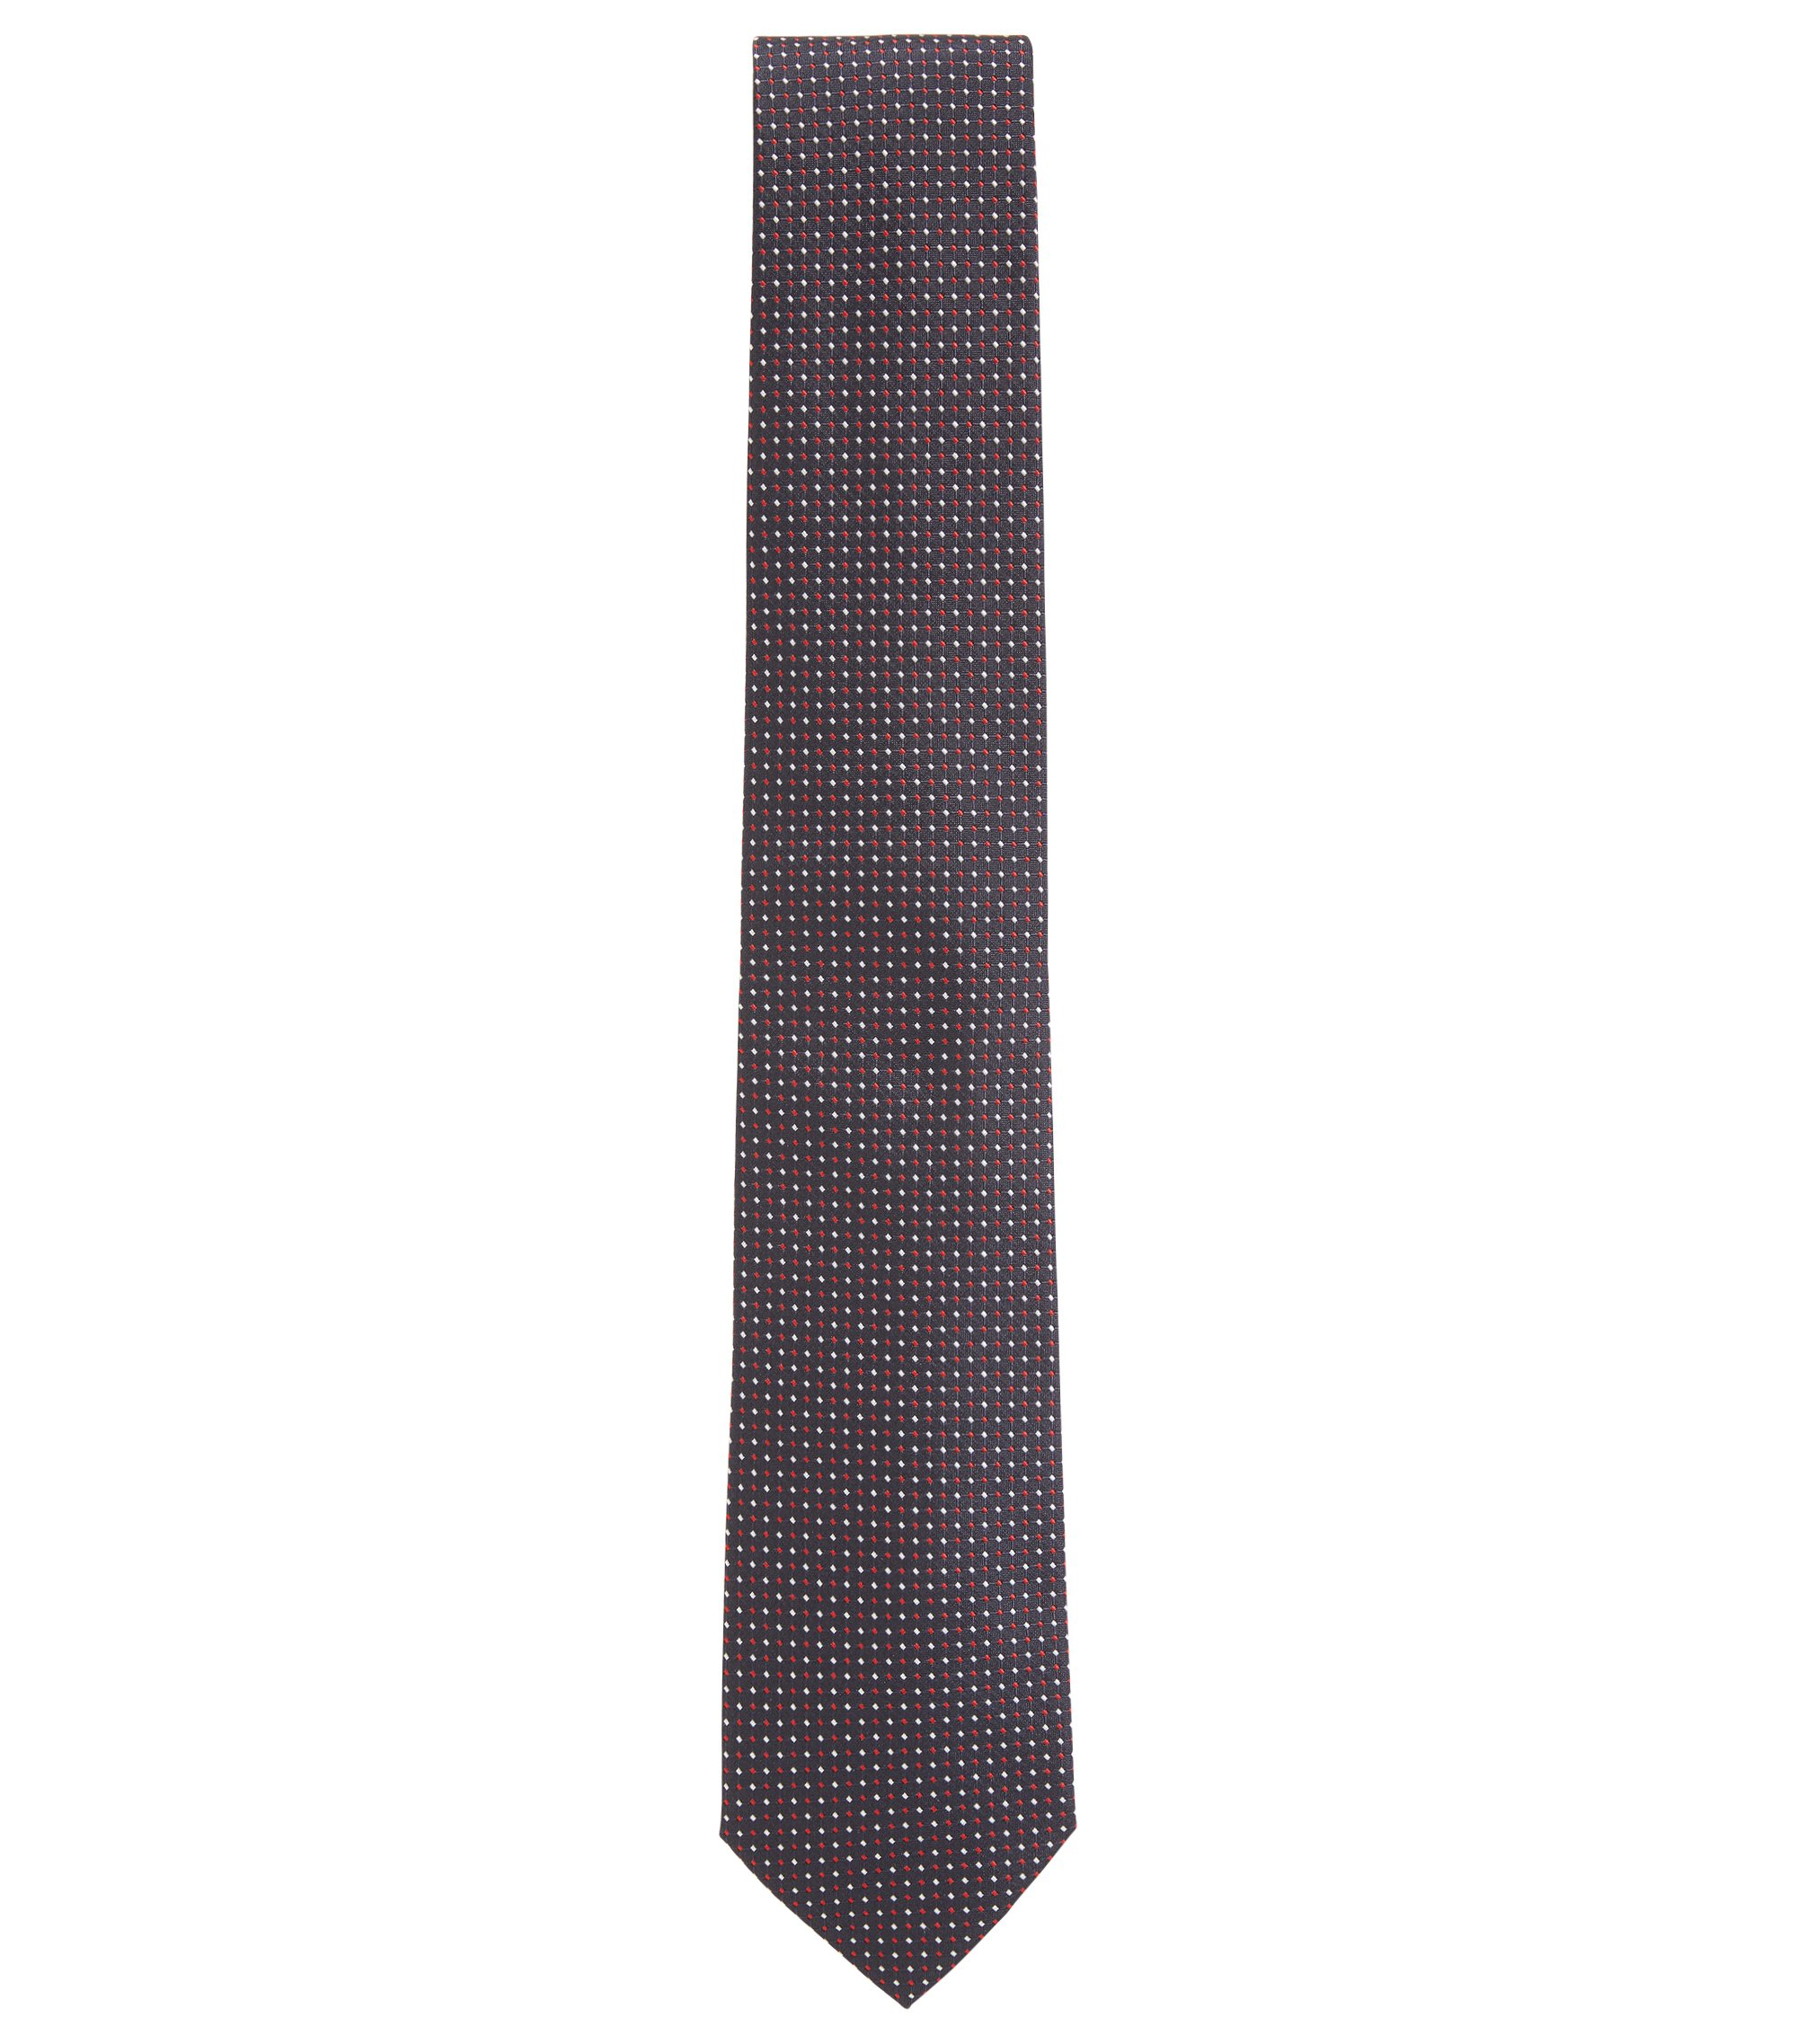 Gemusterte Krawatte aus Seiden-Jacquard, Rot